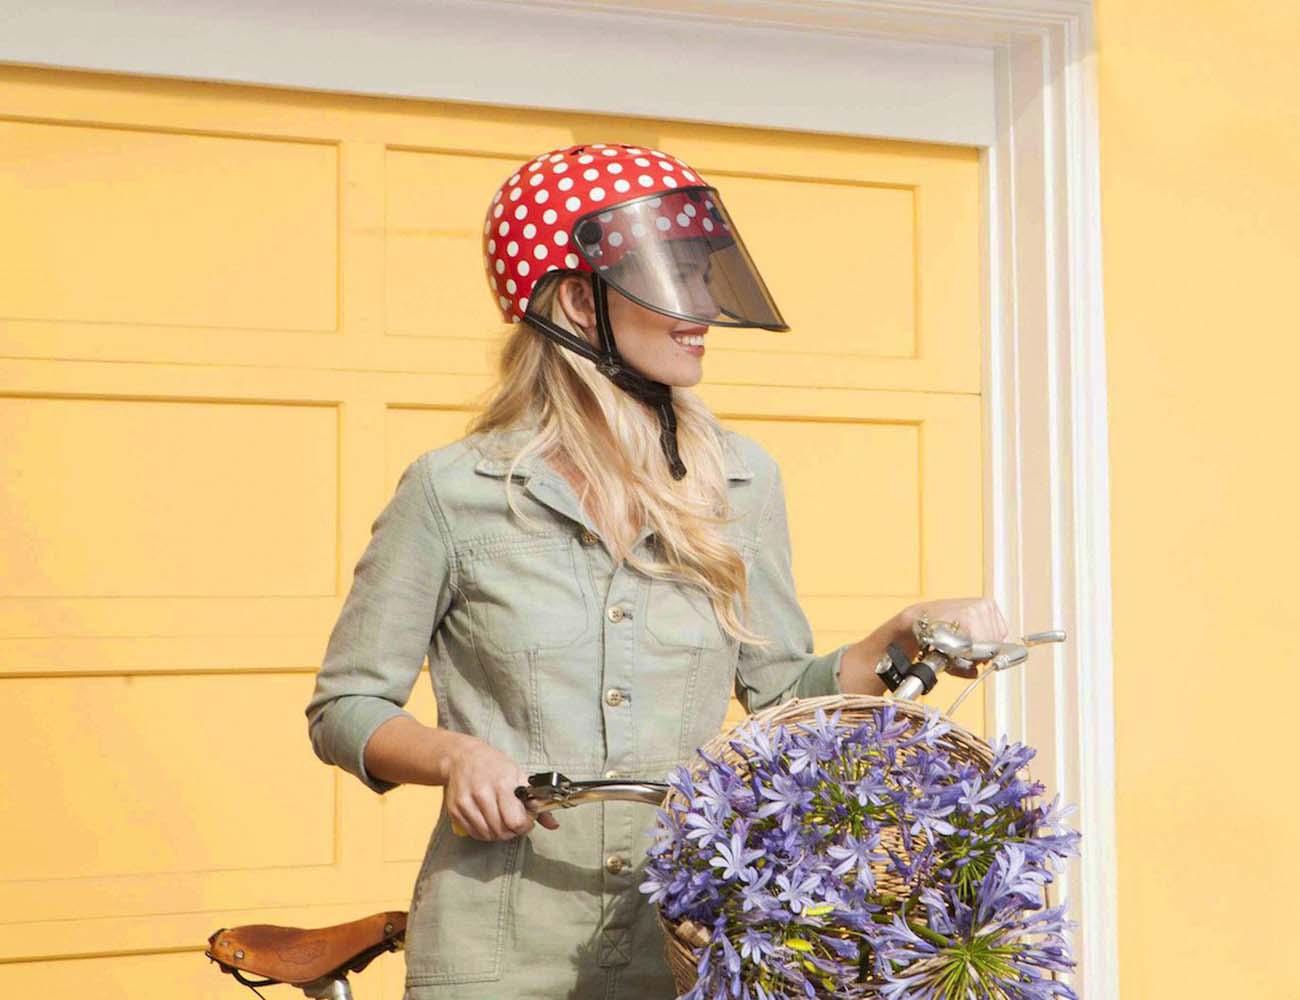 The Bouclier Visor: Sun Protection On Your Bike Helmet